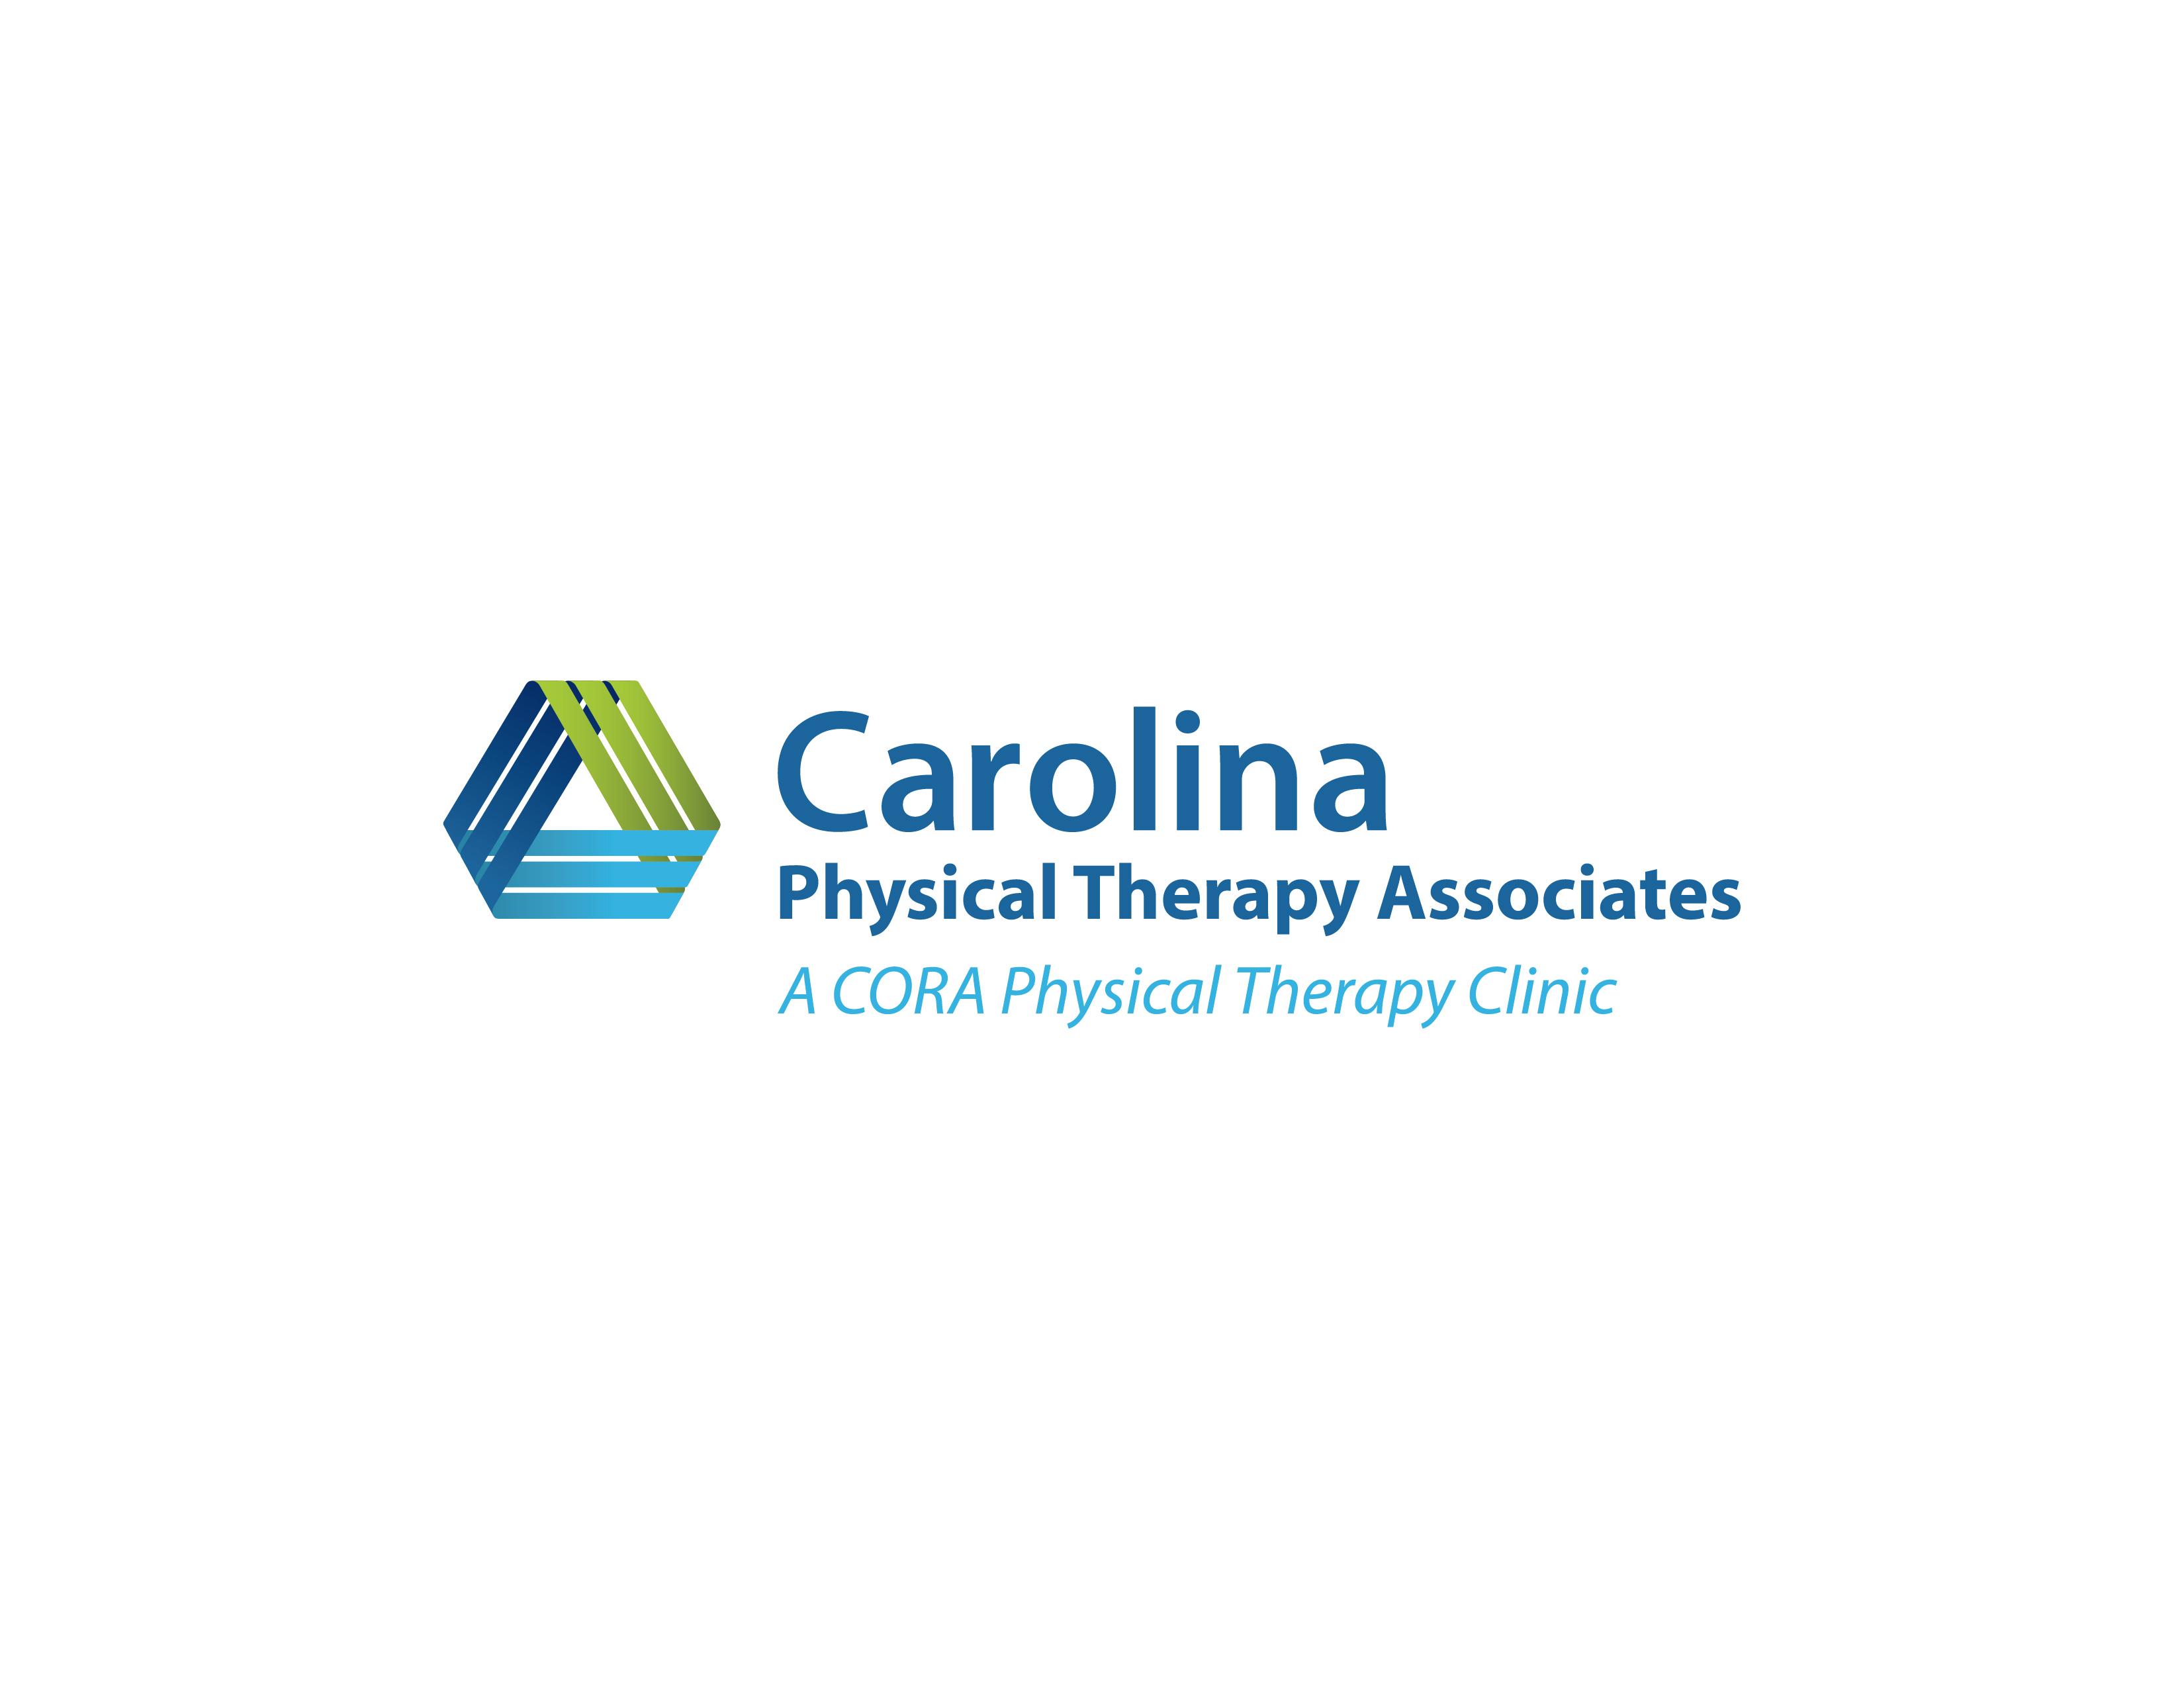 Carolina Physical Therapy